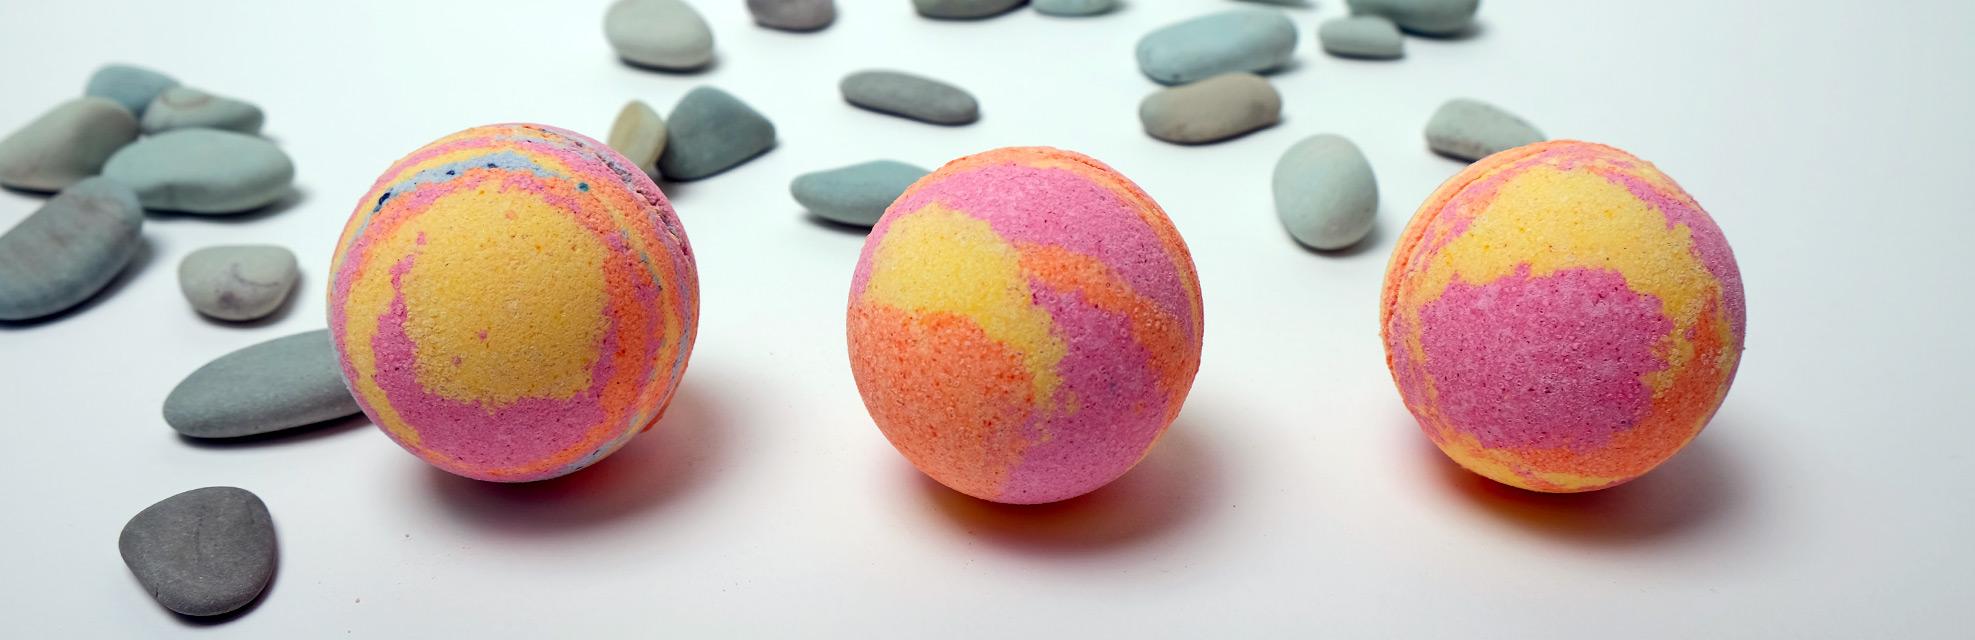 lorann oils soap & bath bomb molds